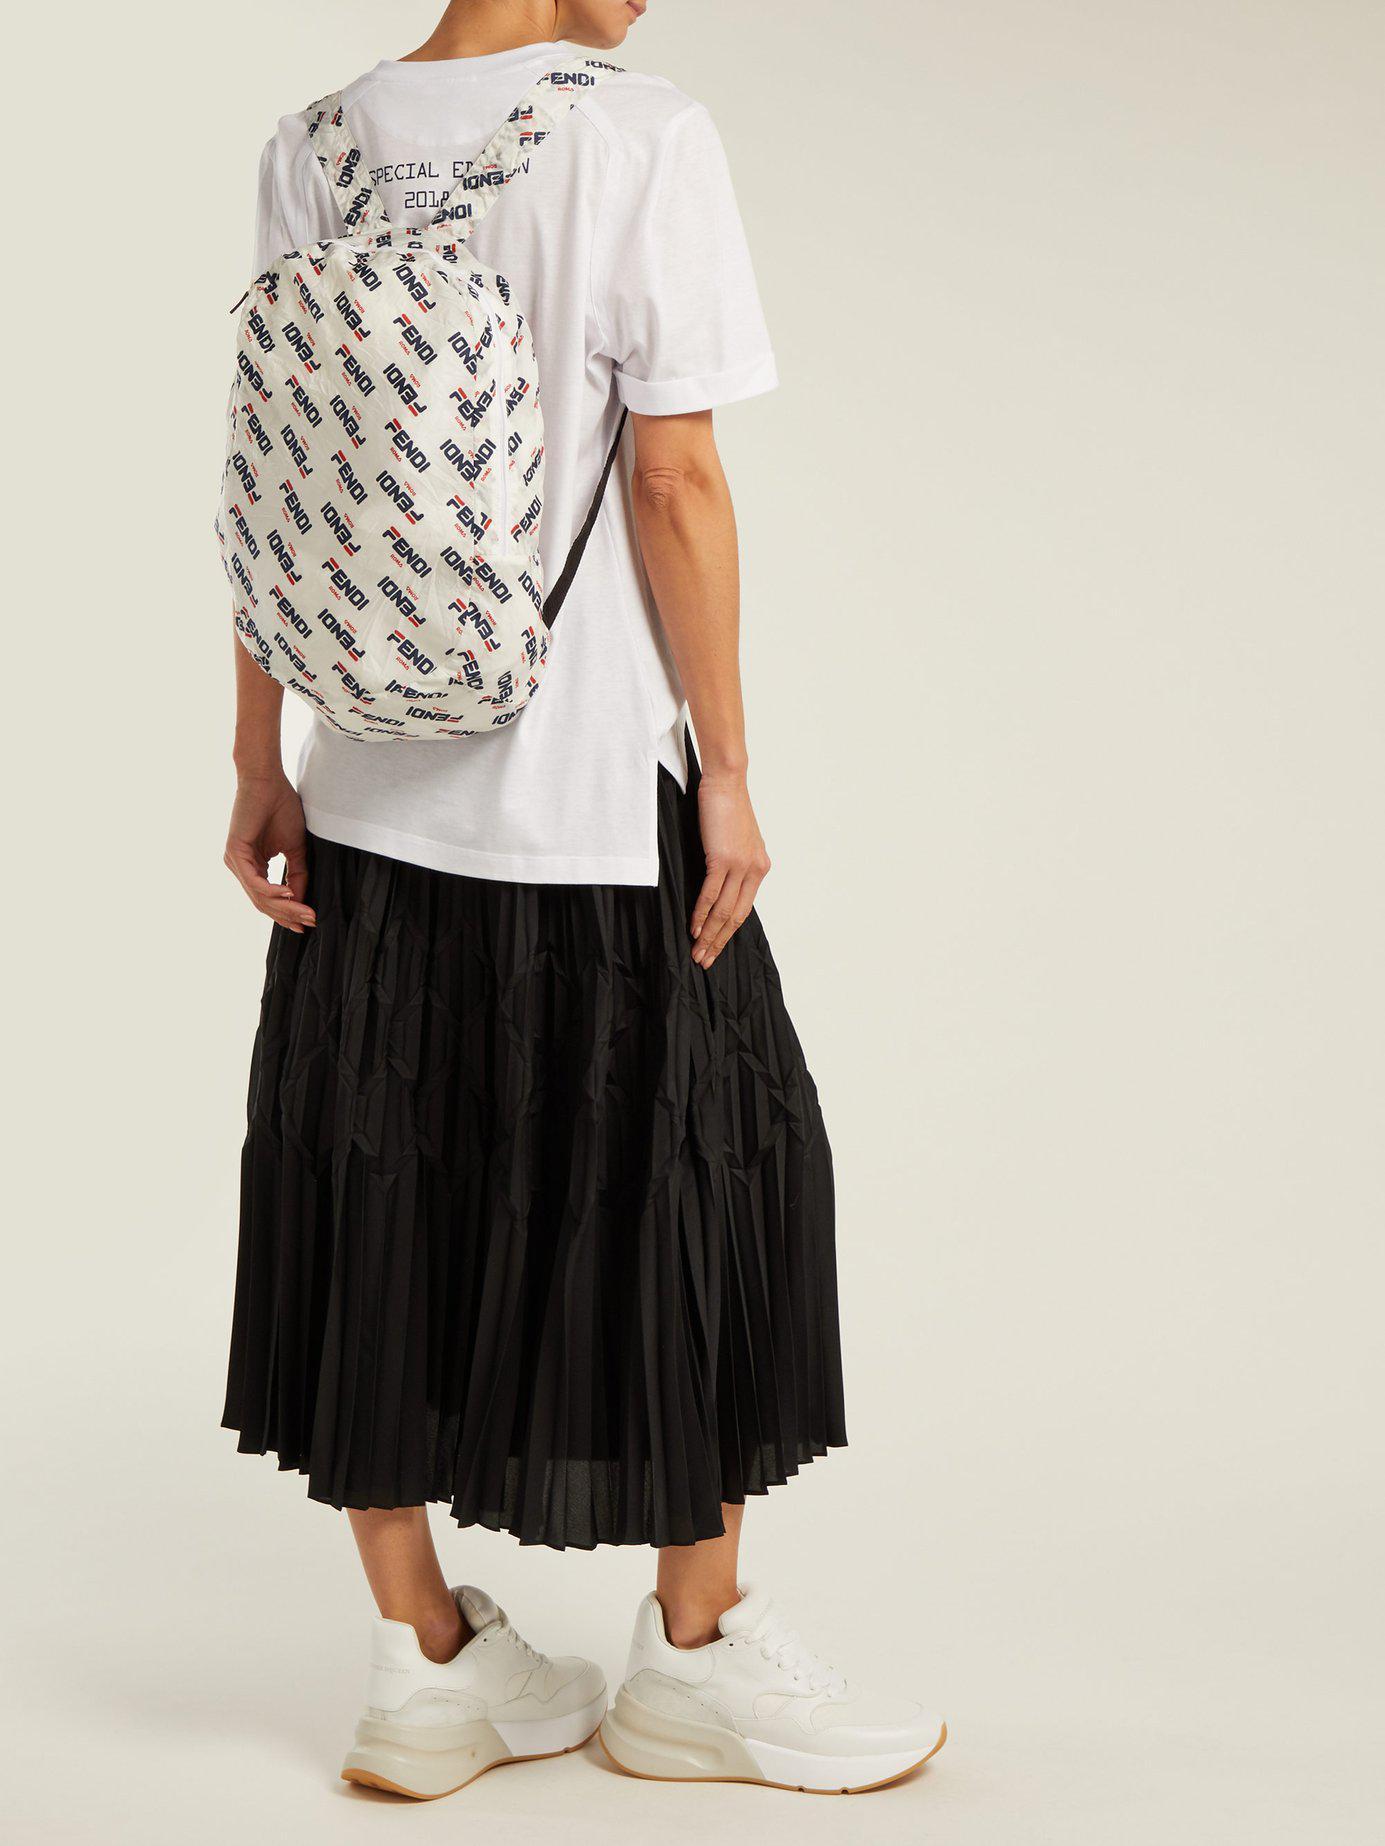 478a8efc2af Fendi - White Appliquéd Leather Bag Charm And Shell Backpack - Lyst. View  fullscreen